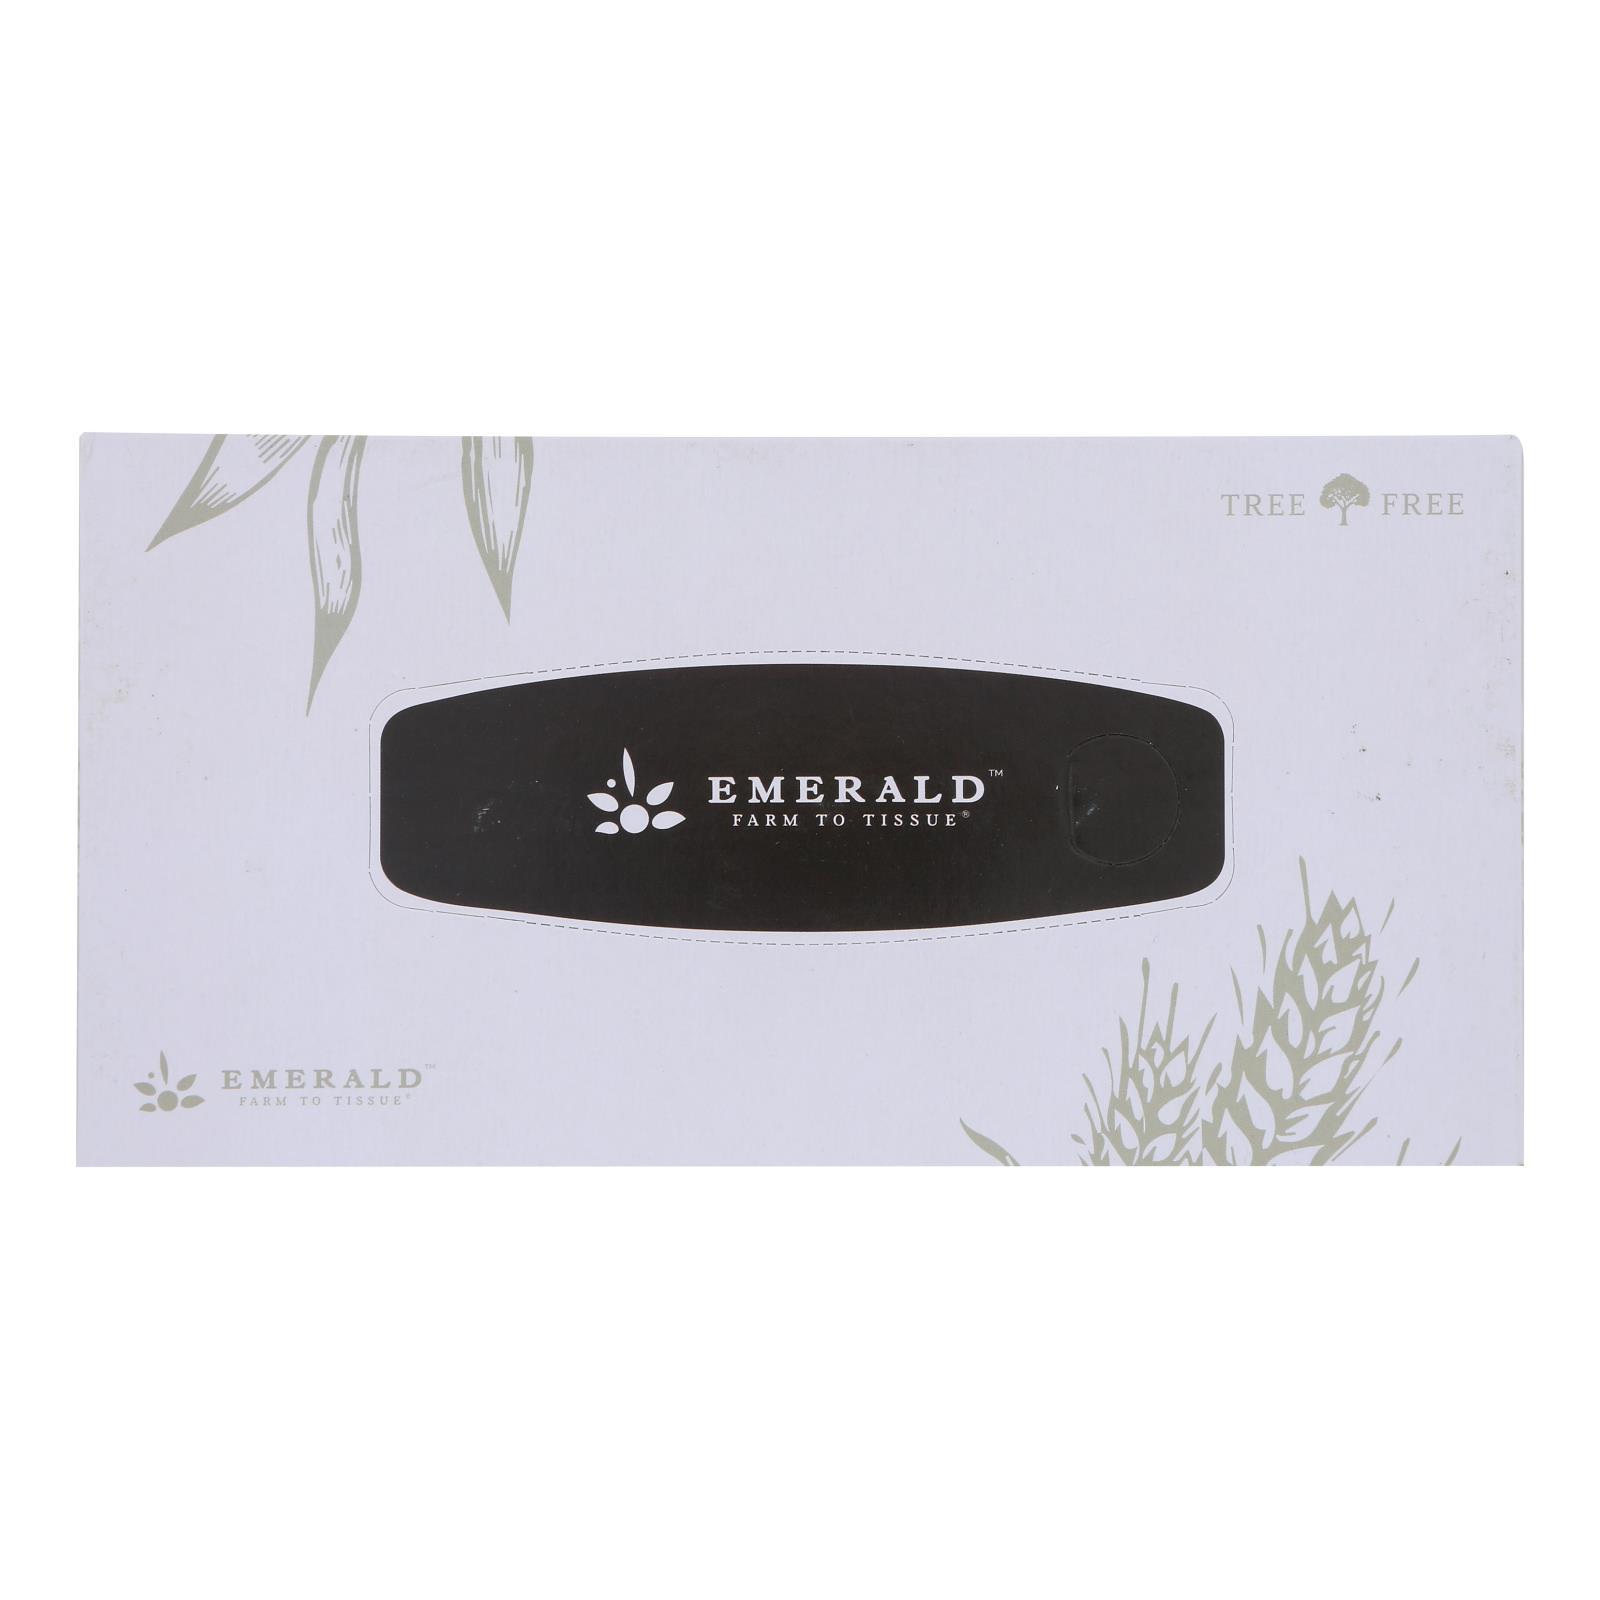 Emerald Brand - Facial Tissue 2 Ply Fltbx - CS of 30-1 CT